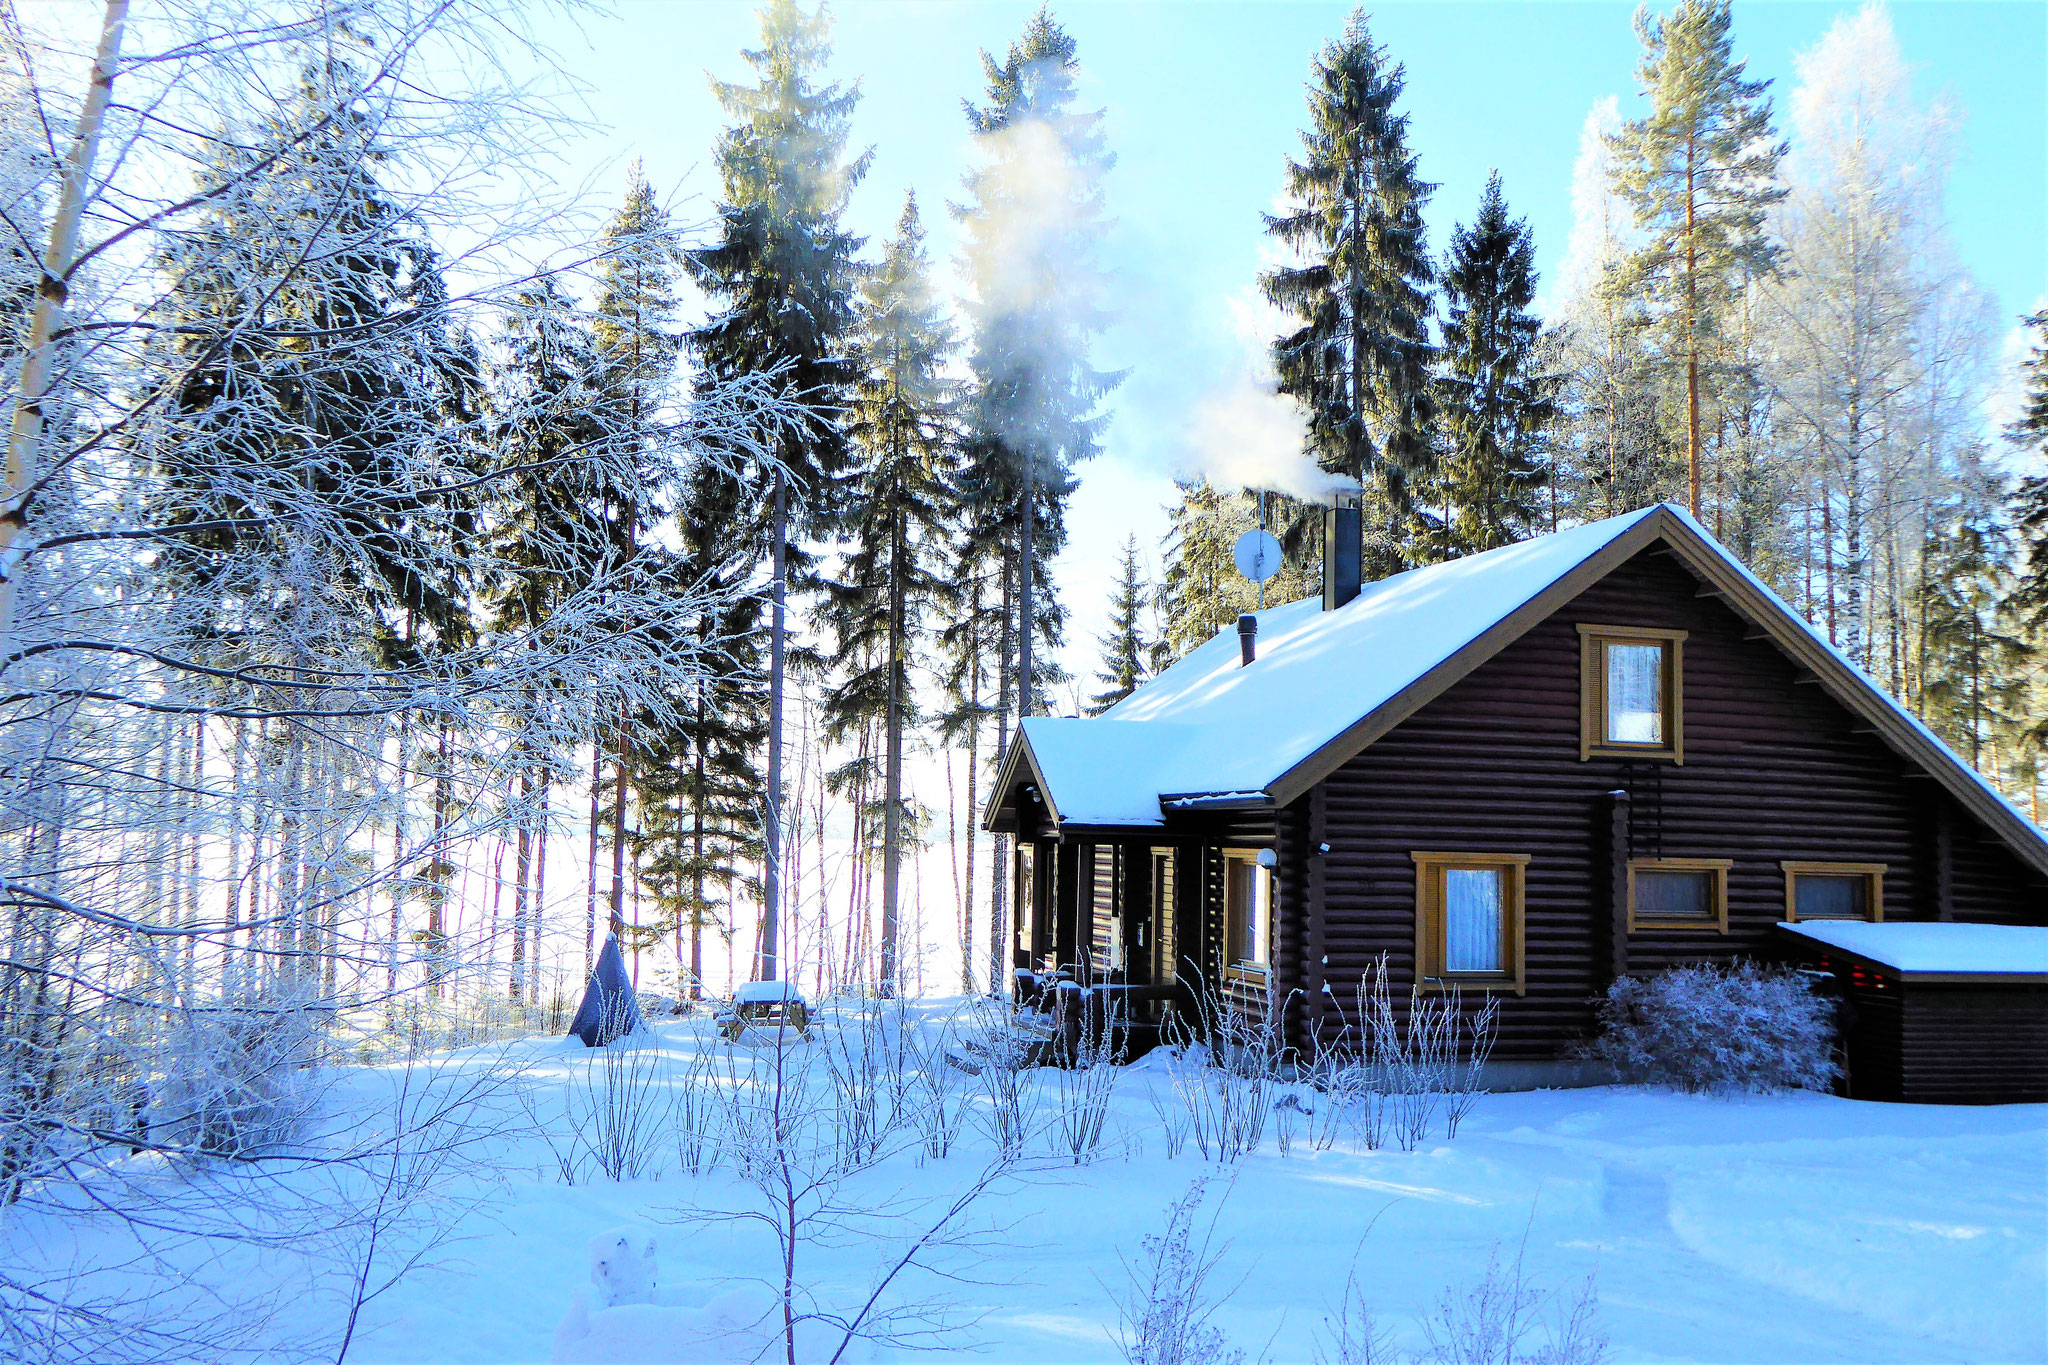 Winter Wonderland near lake. Log house Sunny Mökki Sysmä. 2x All Terrainskies. 2x Cross-Countryskies. 2x Snow shoes. 2 Winter Bikes. Equipment for 2 adults included